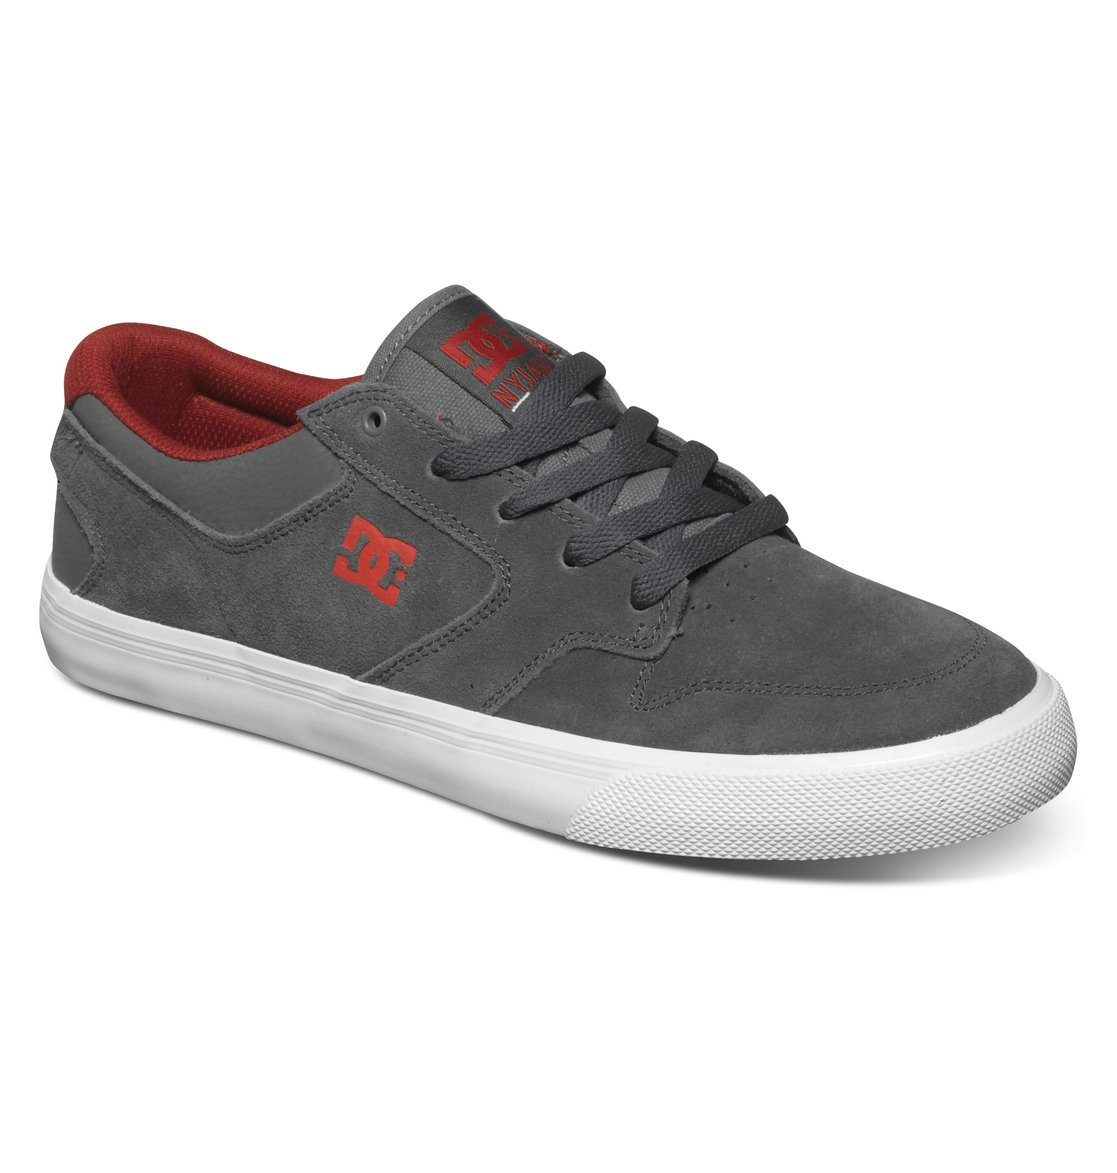 Dc Men S Nyjah Shoes Vulc Adys